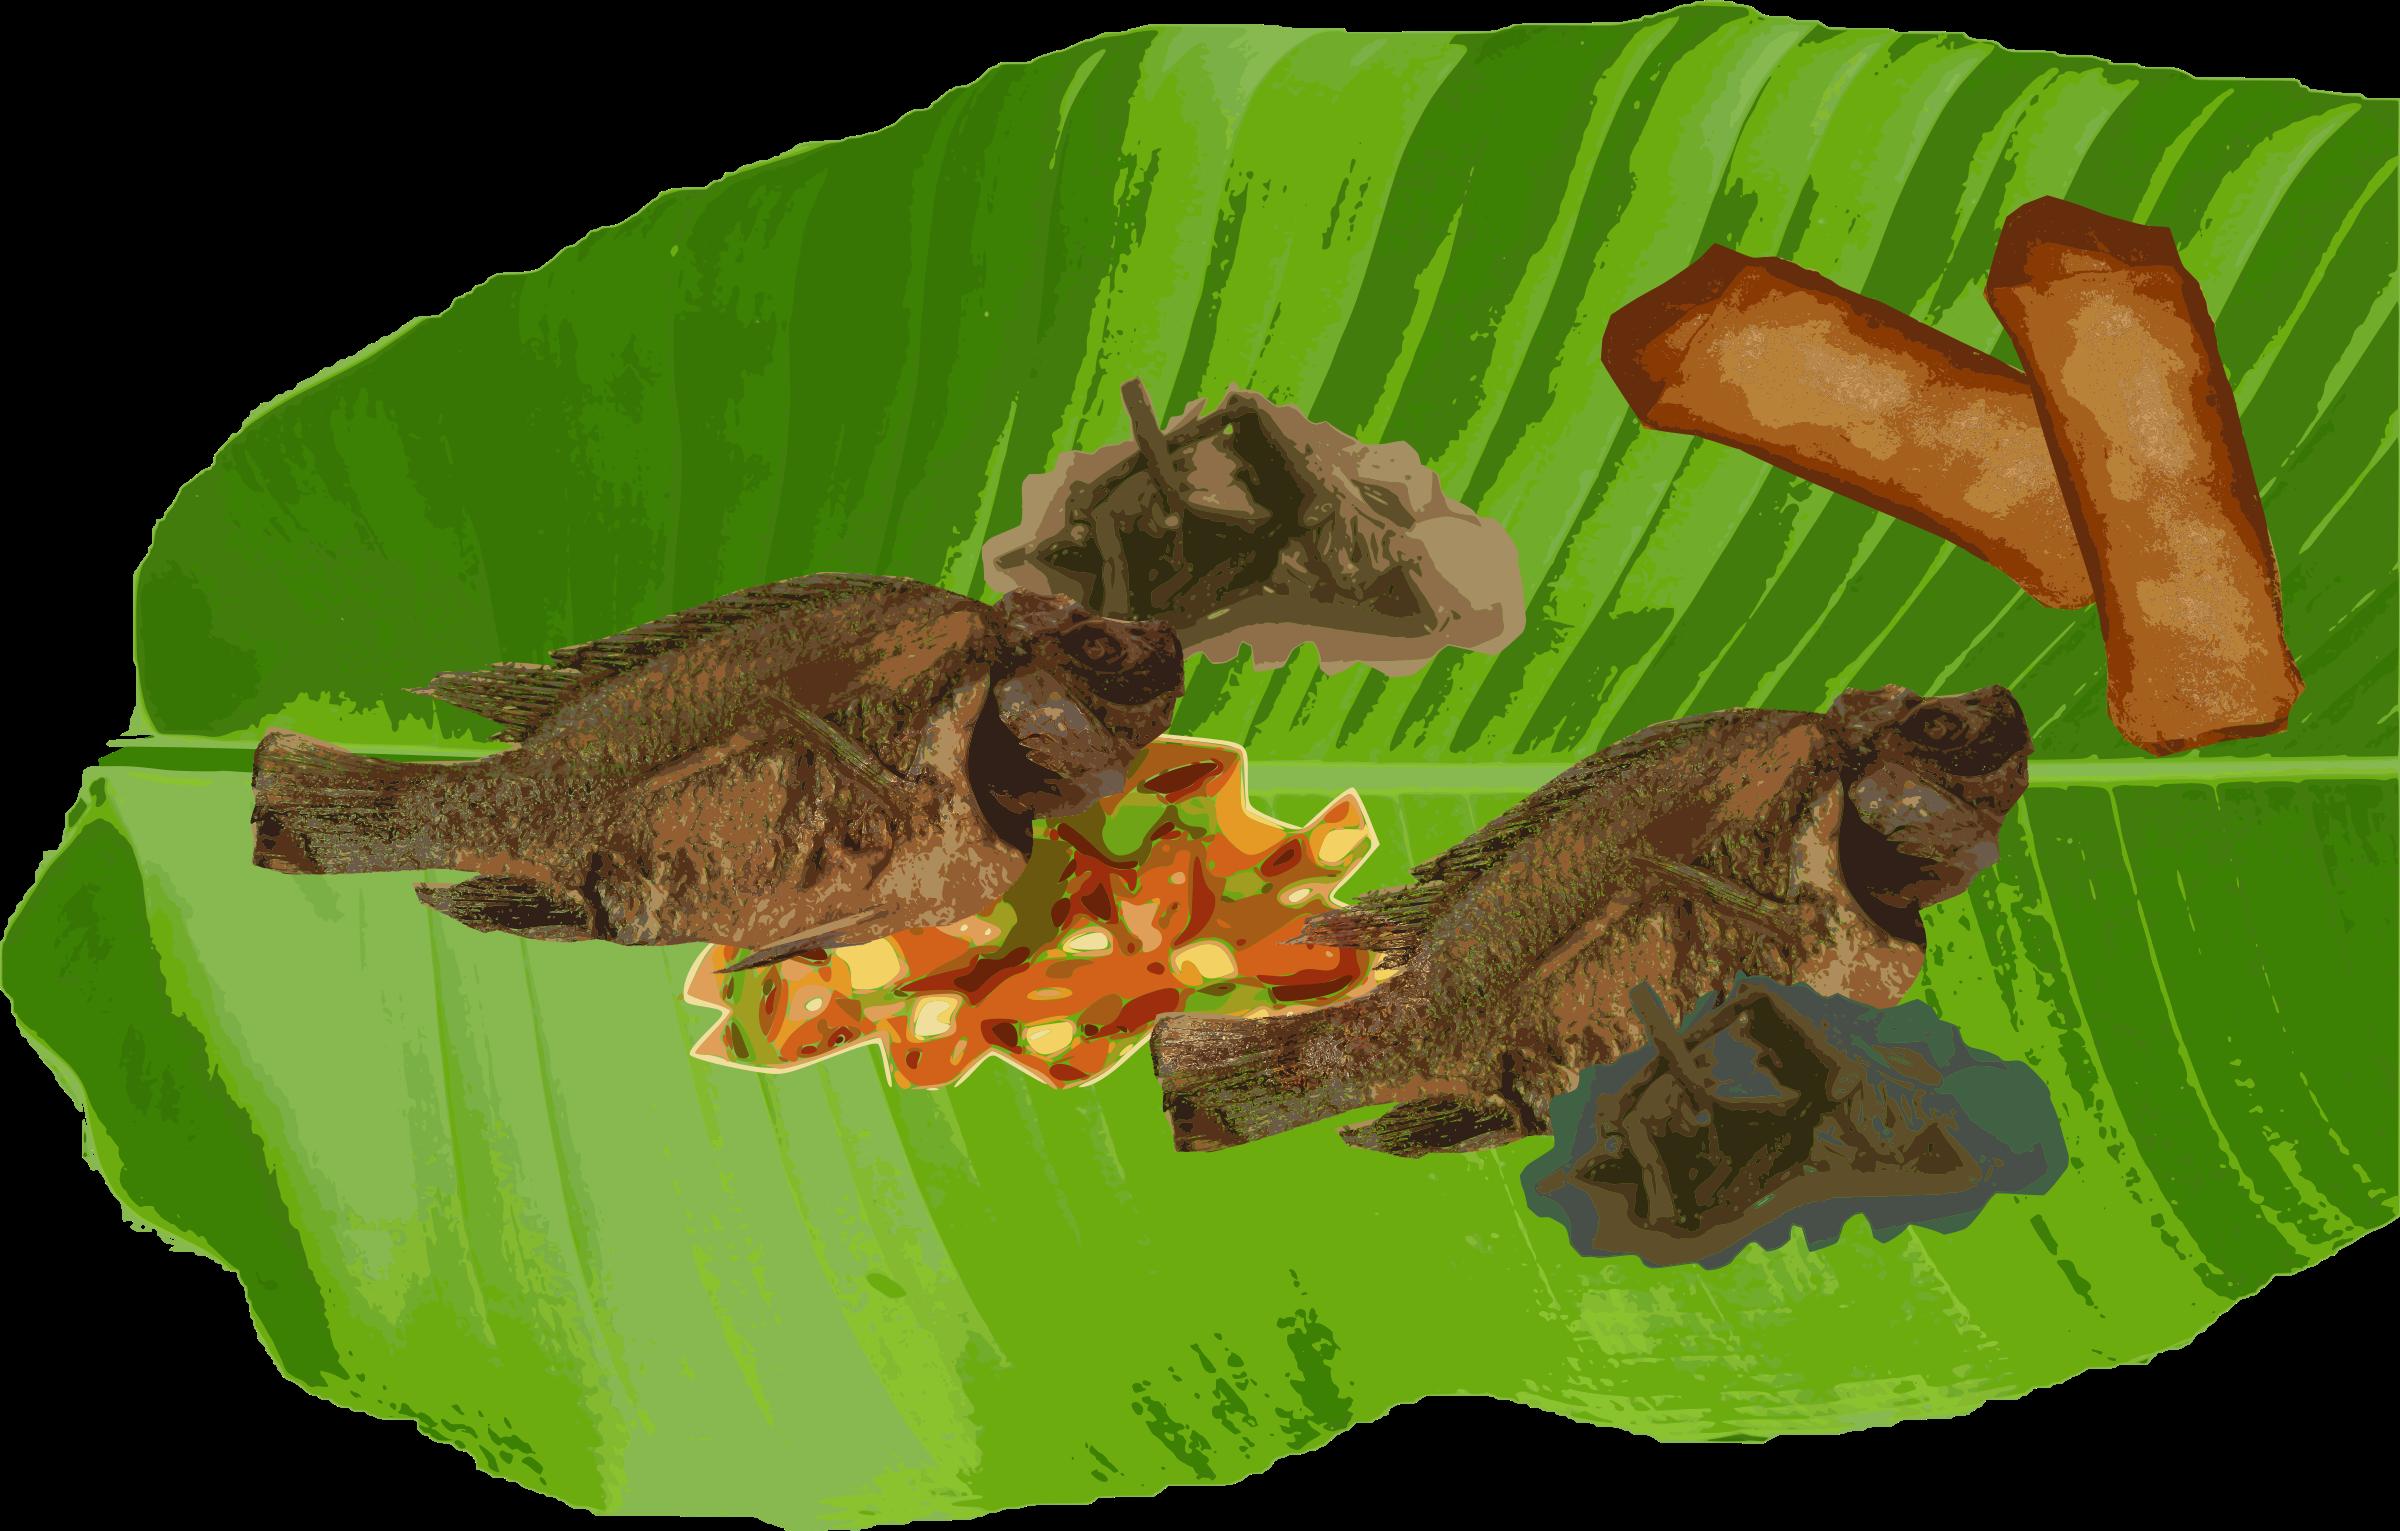 Feast clipart filipino food. Boodle fight big image